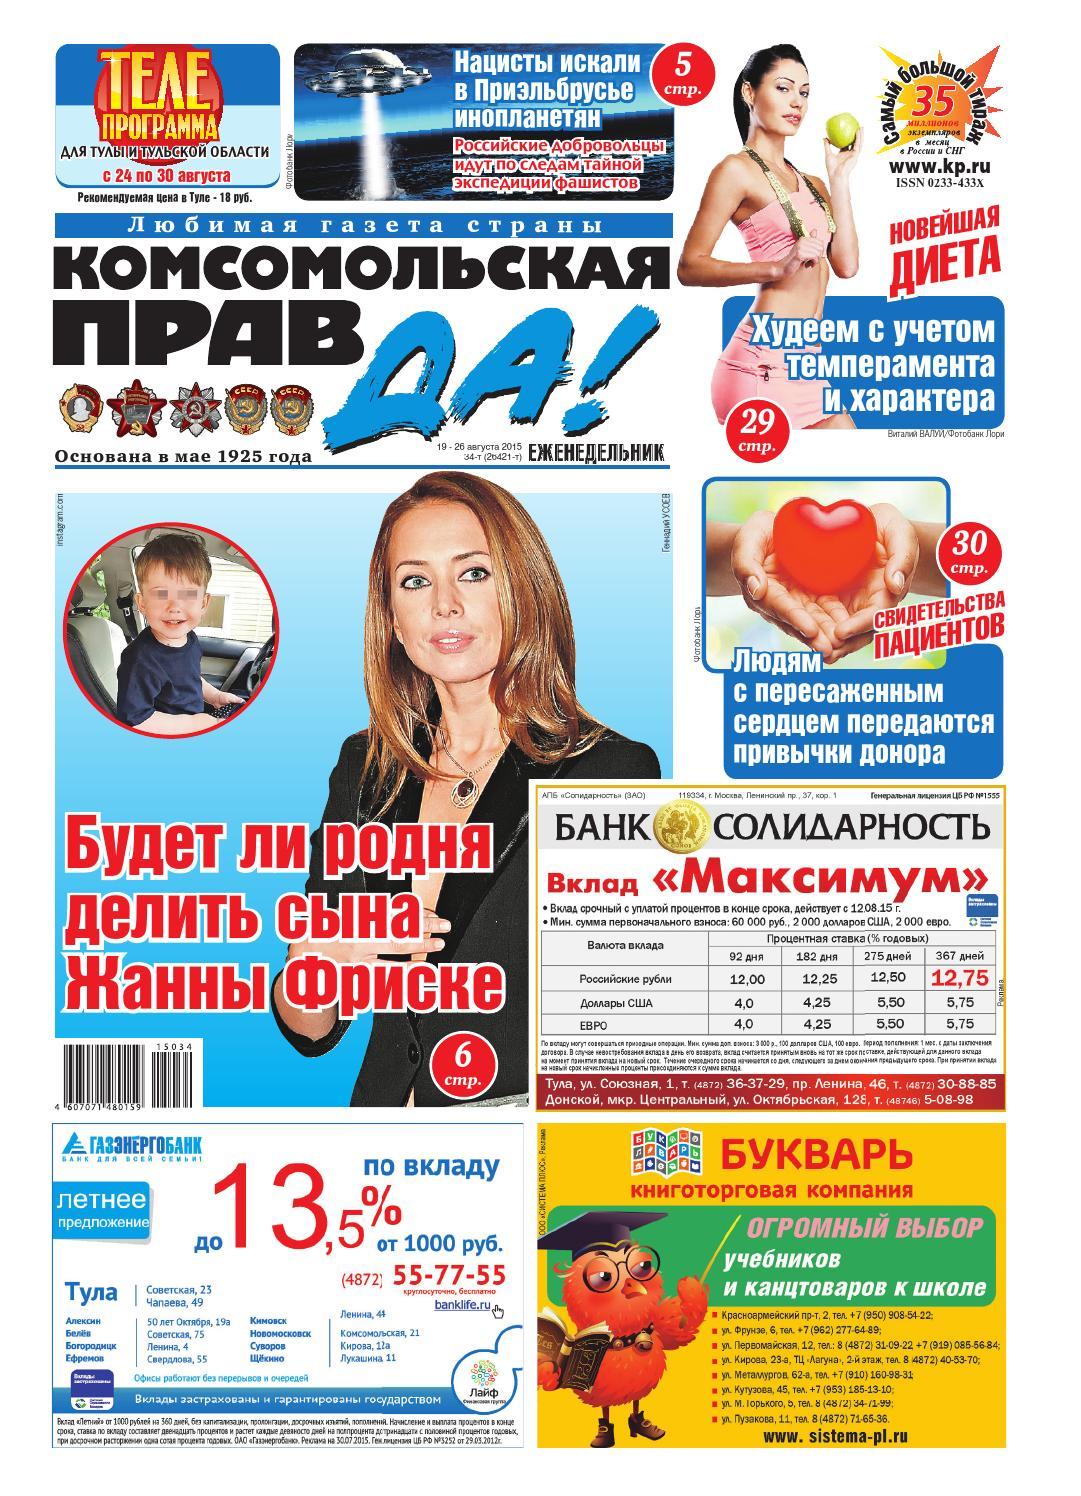 Глая Жанна Фриске